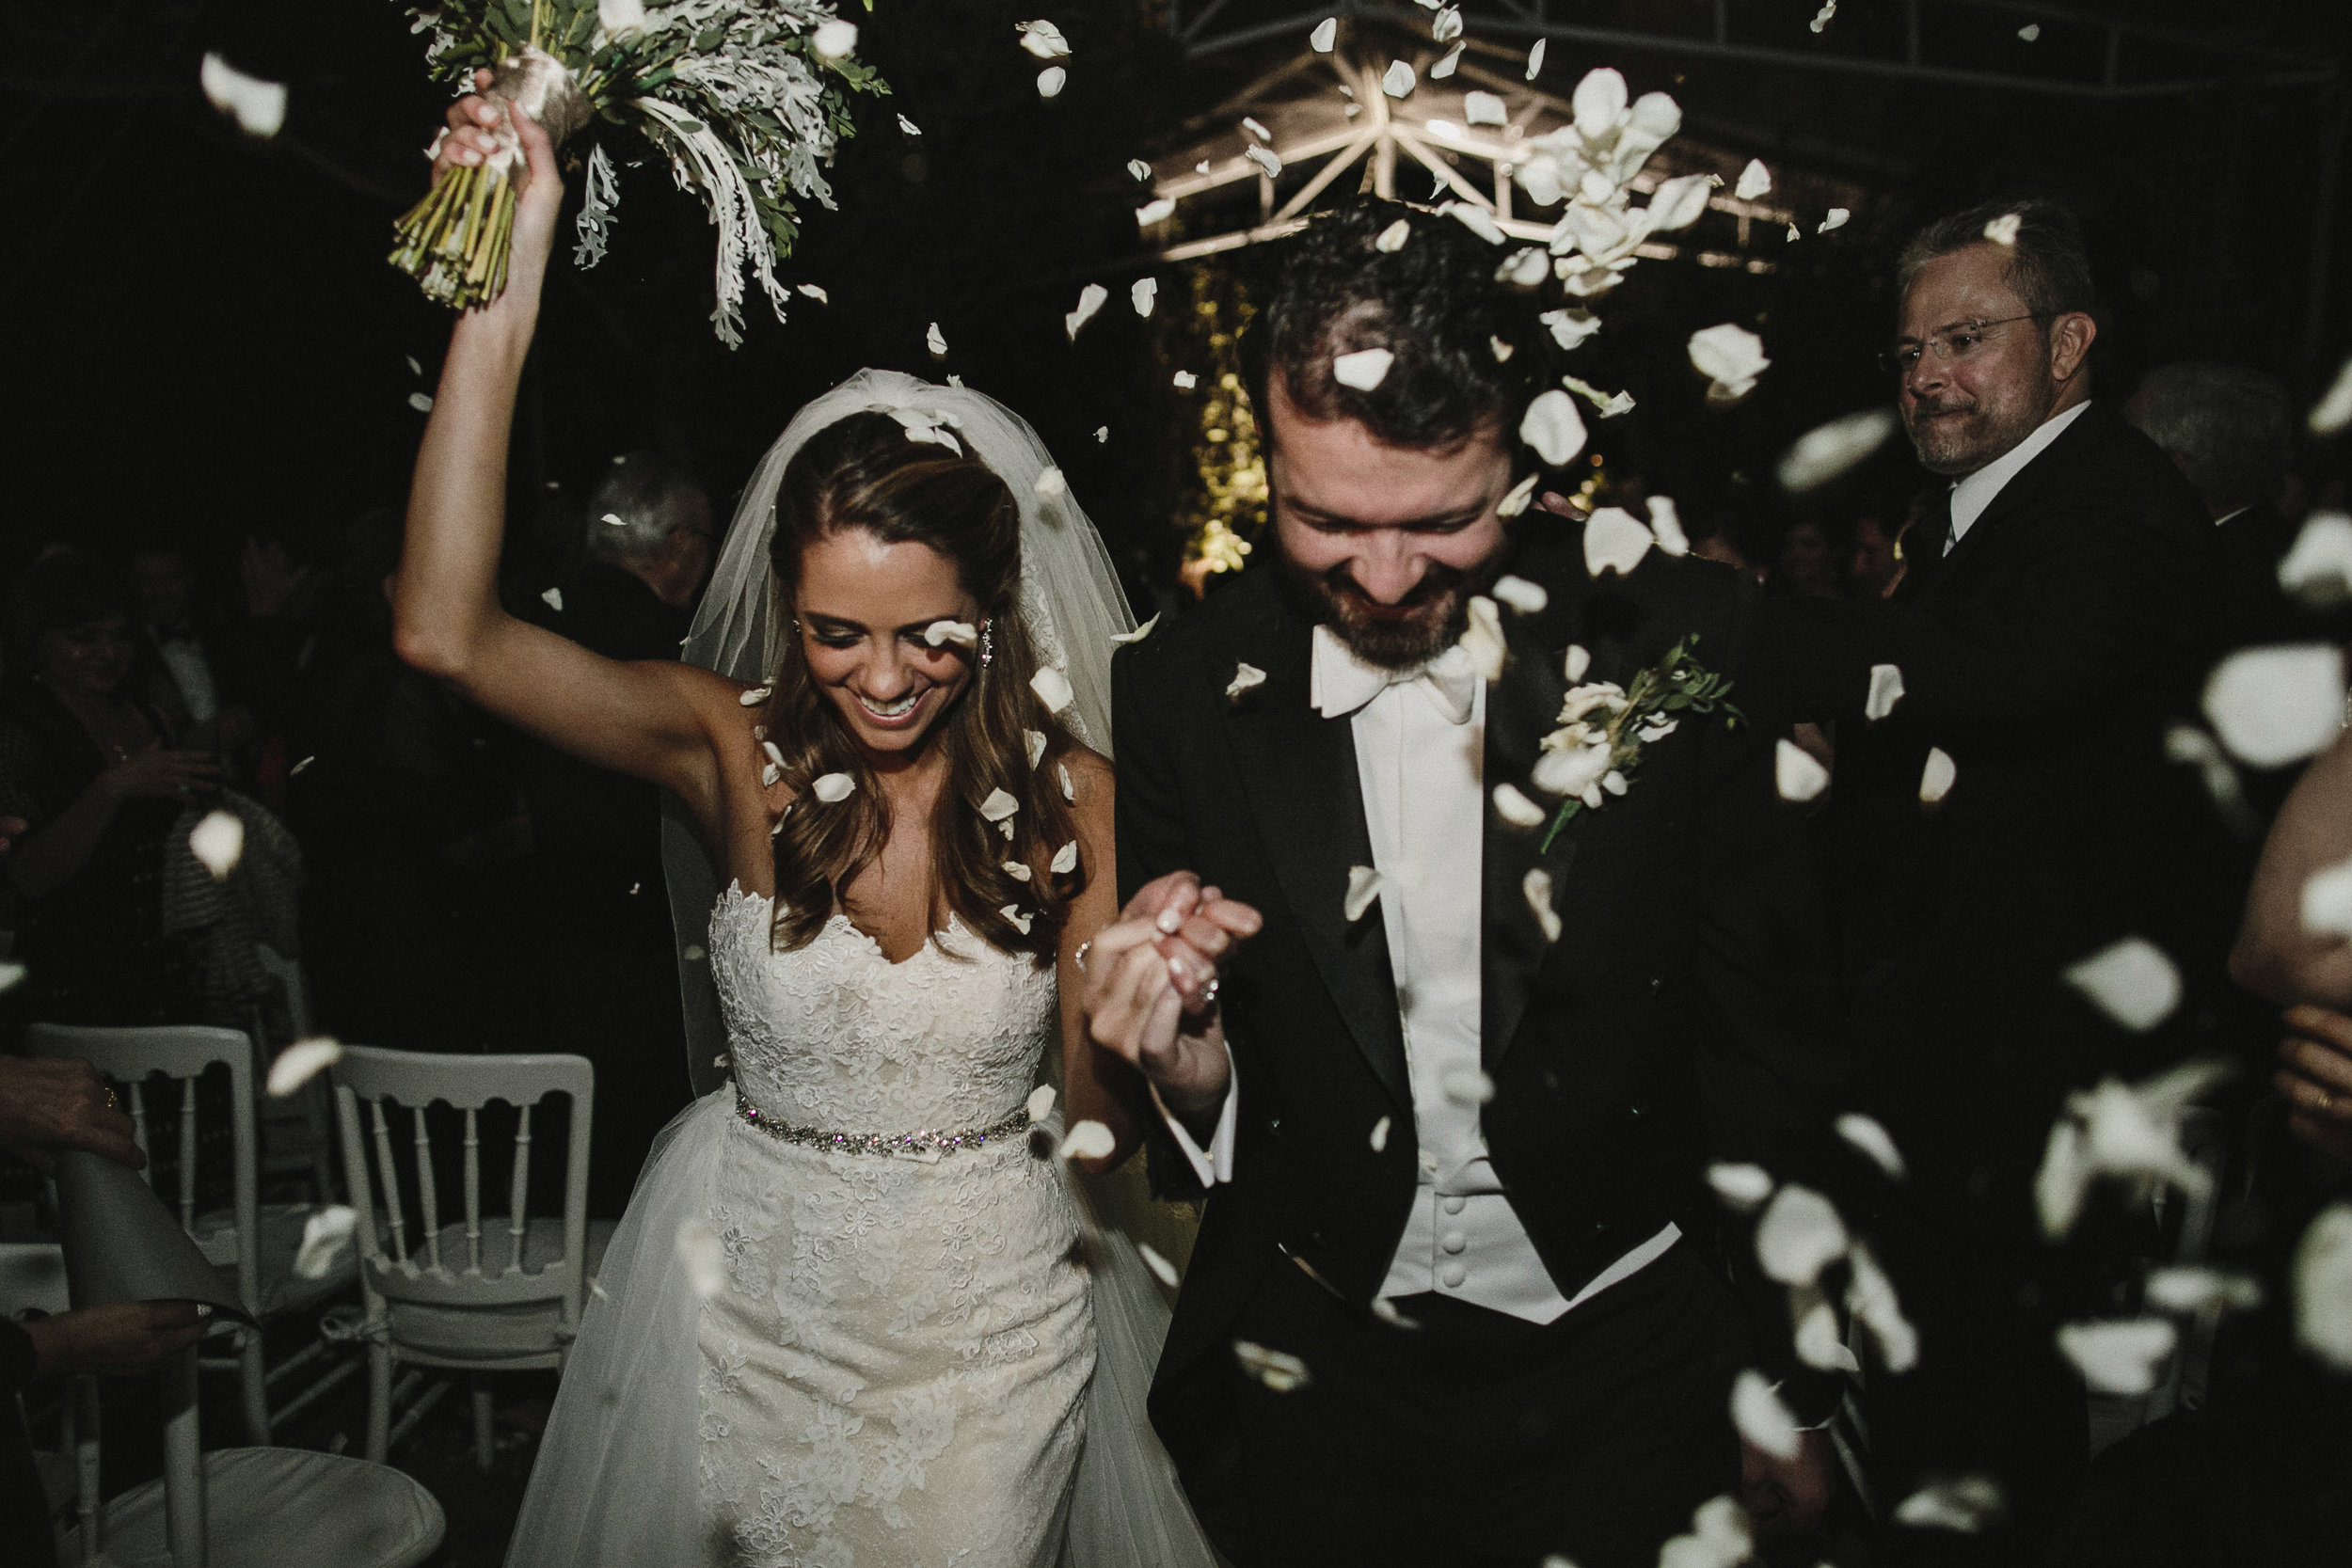 alfonso_flores_destination_wedding_photogrpahy_paola_alonso-674.JPG